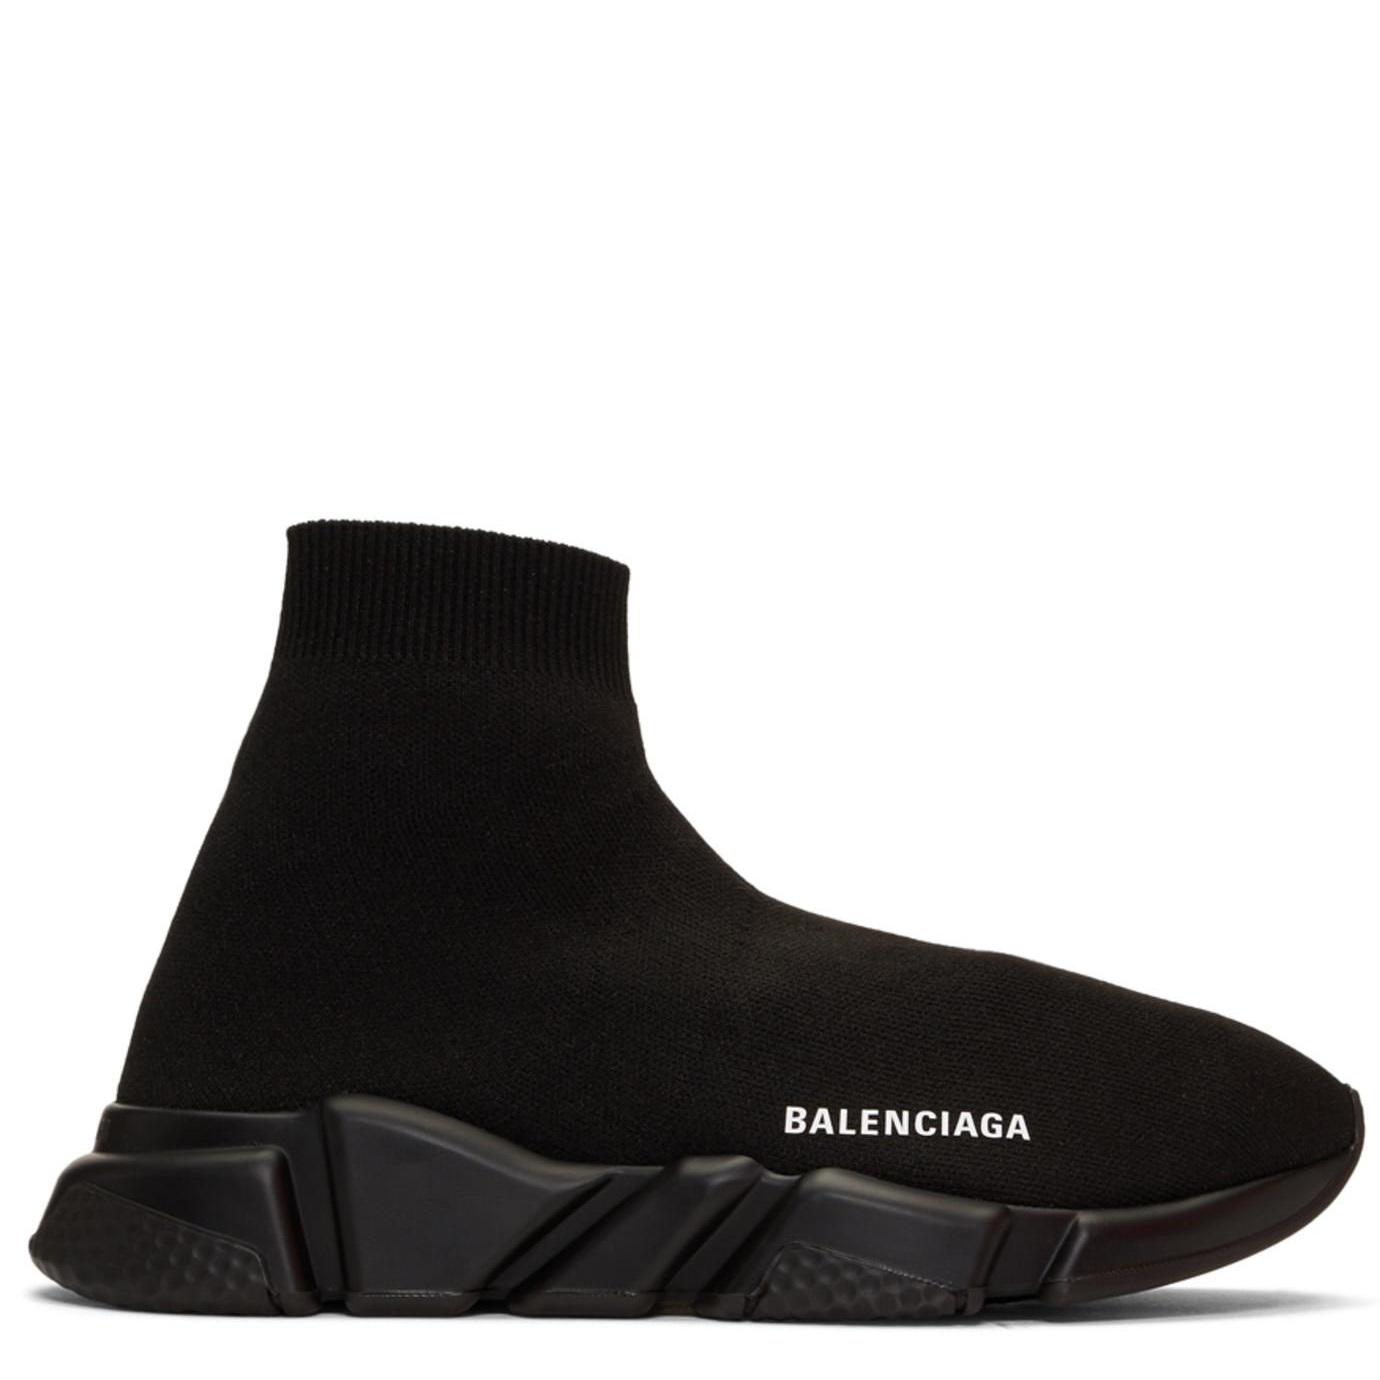 Balenciaga Speed Trainer Black | ARIANNO